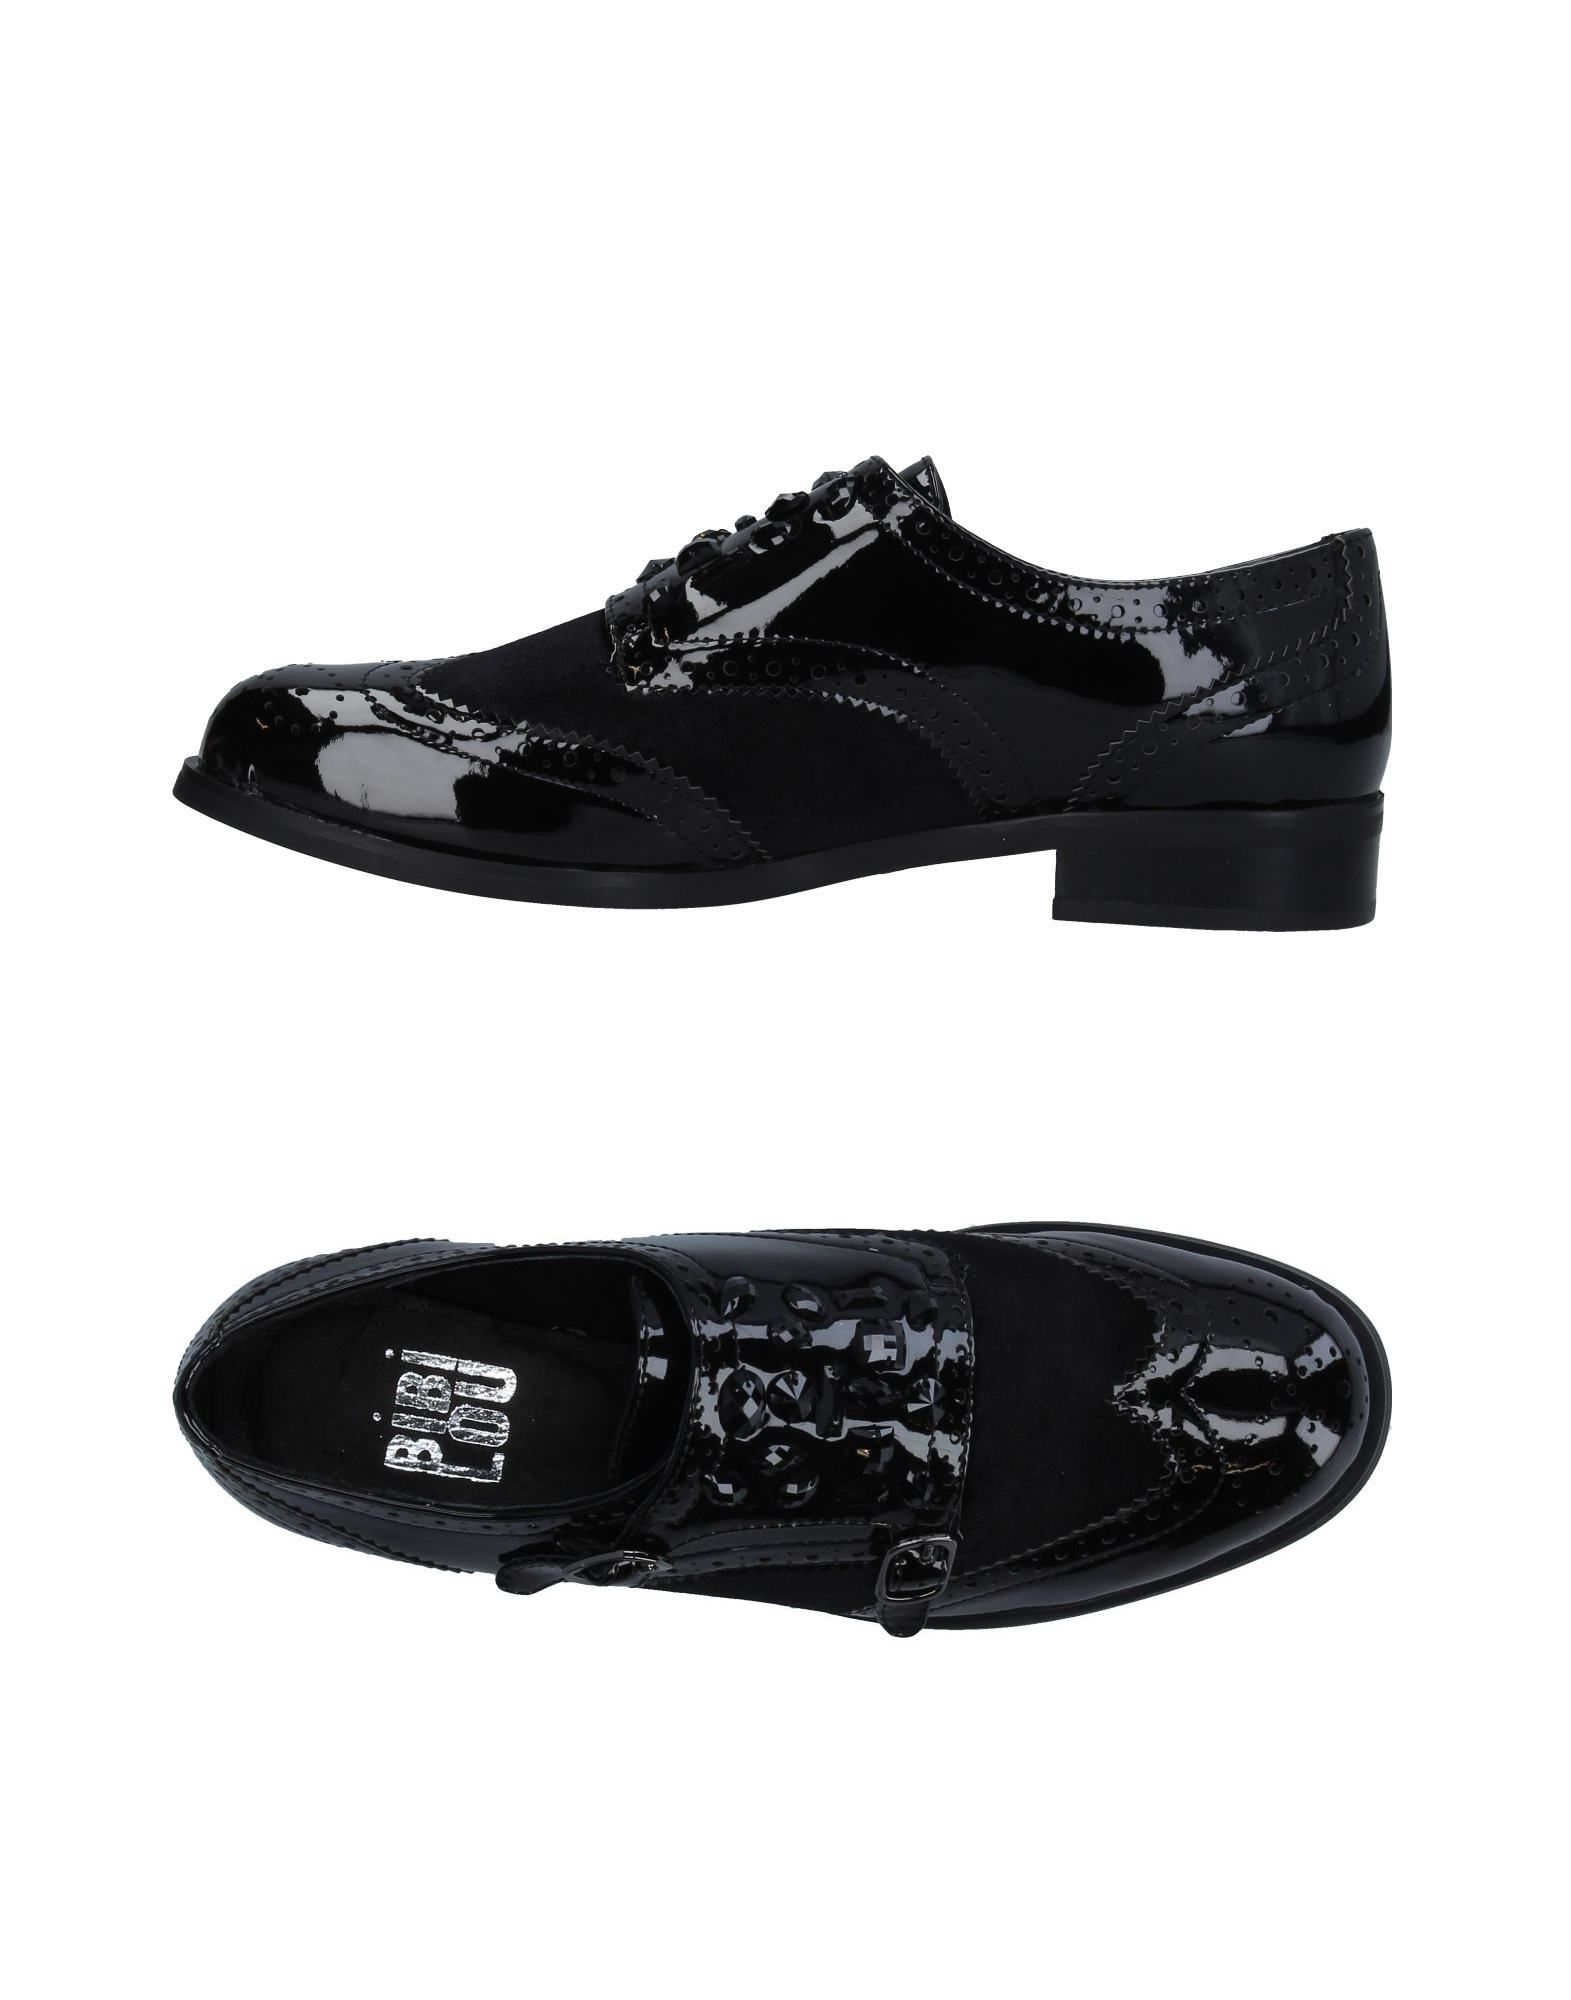 Sneakers Geox Donna - 11554171QJ comode Nuove offerte e scarpe comode 11554171QJ 669760